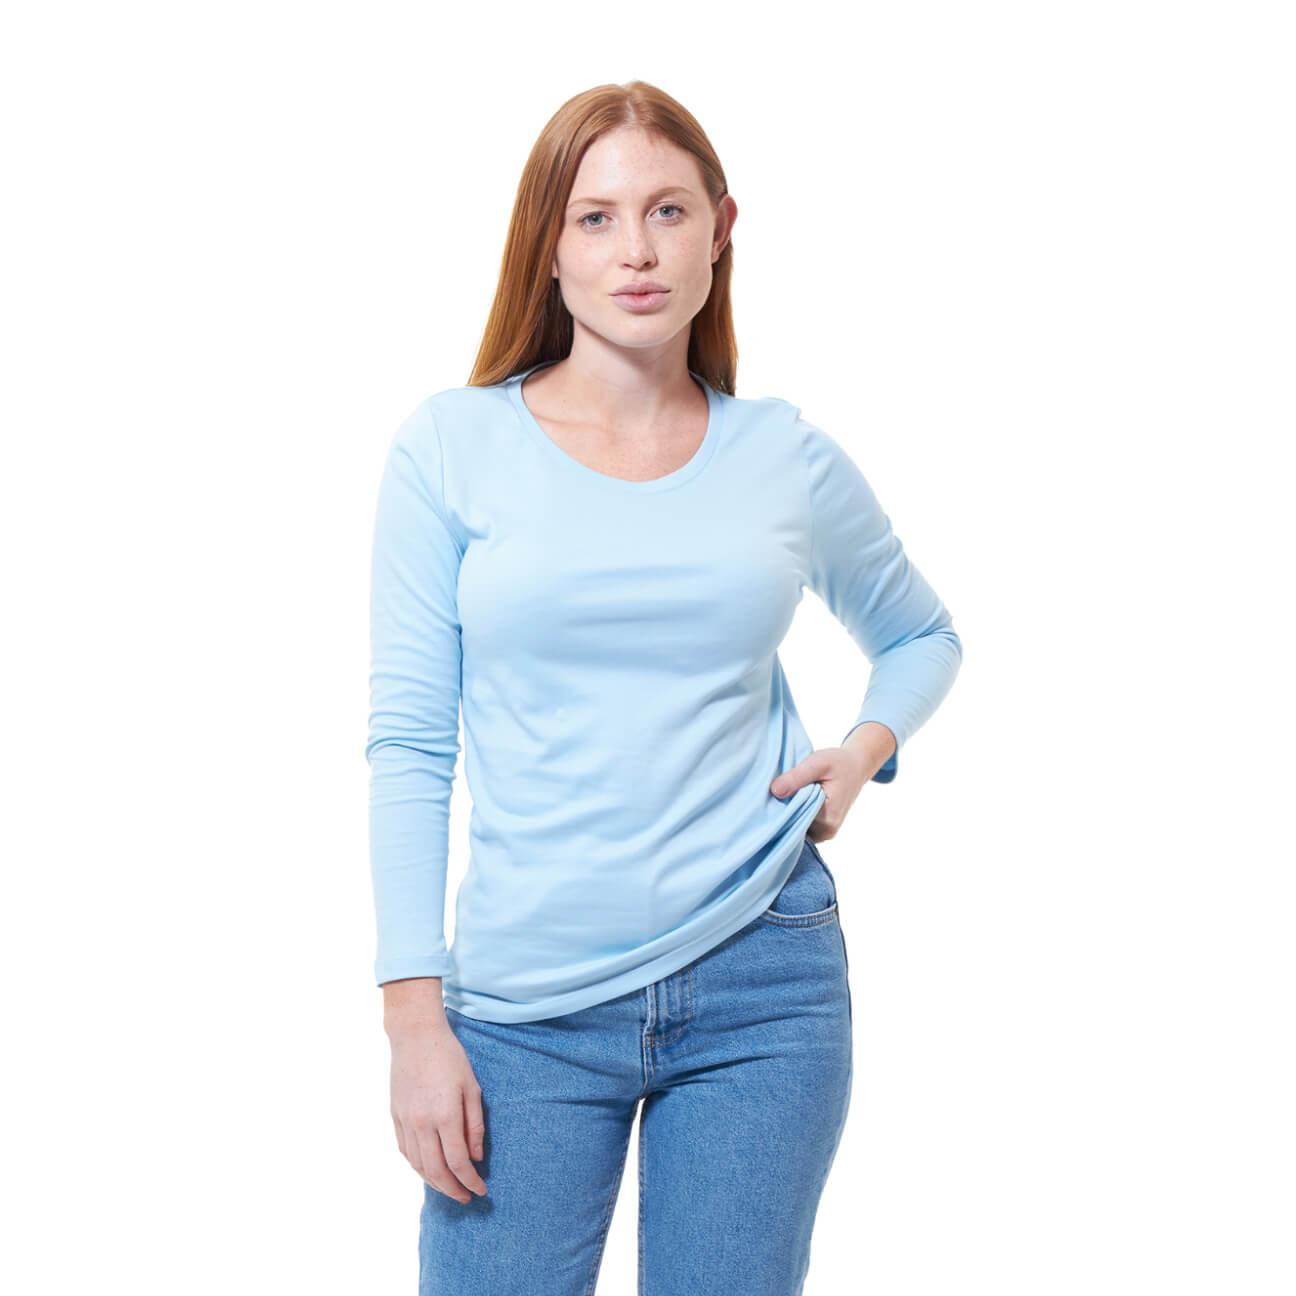 Franela basica dama manga larga azul claro